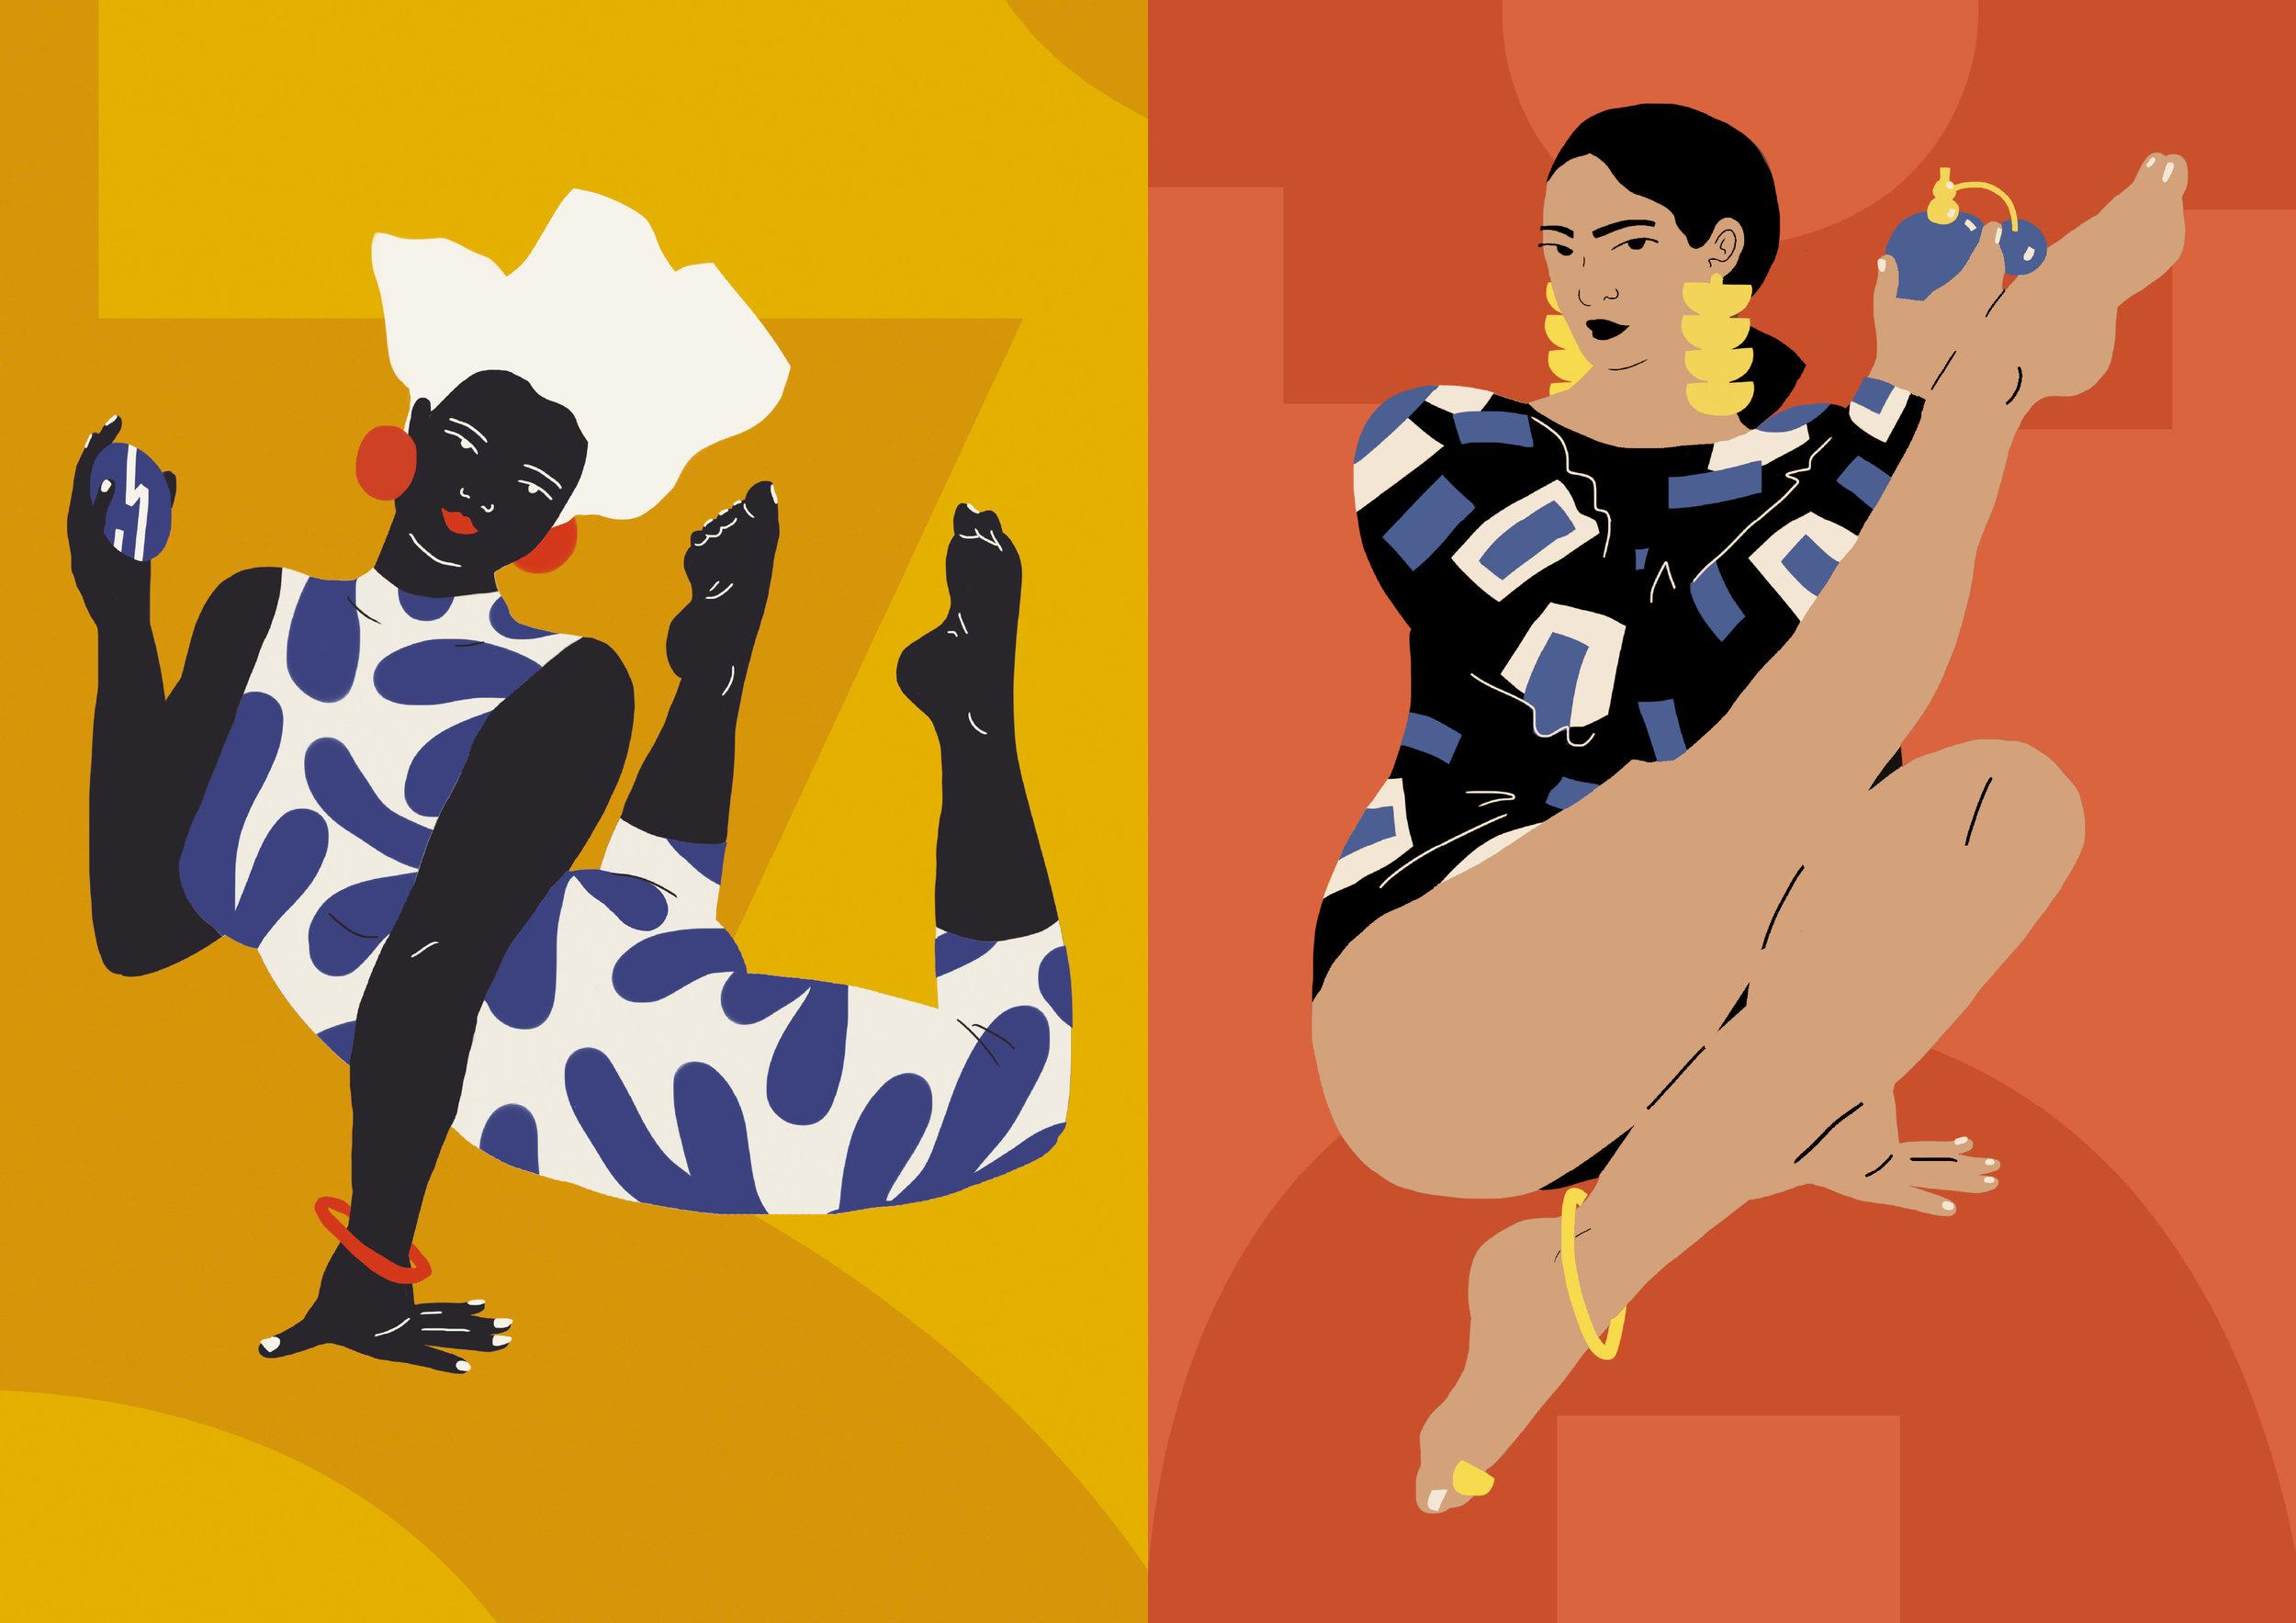 Illustrations by Dai Ruiz